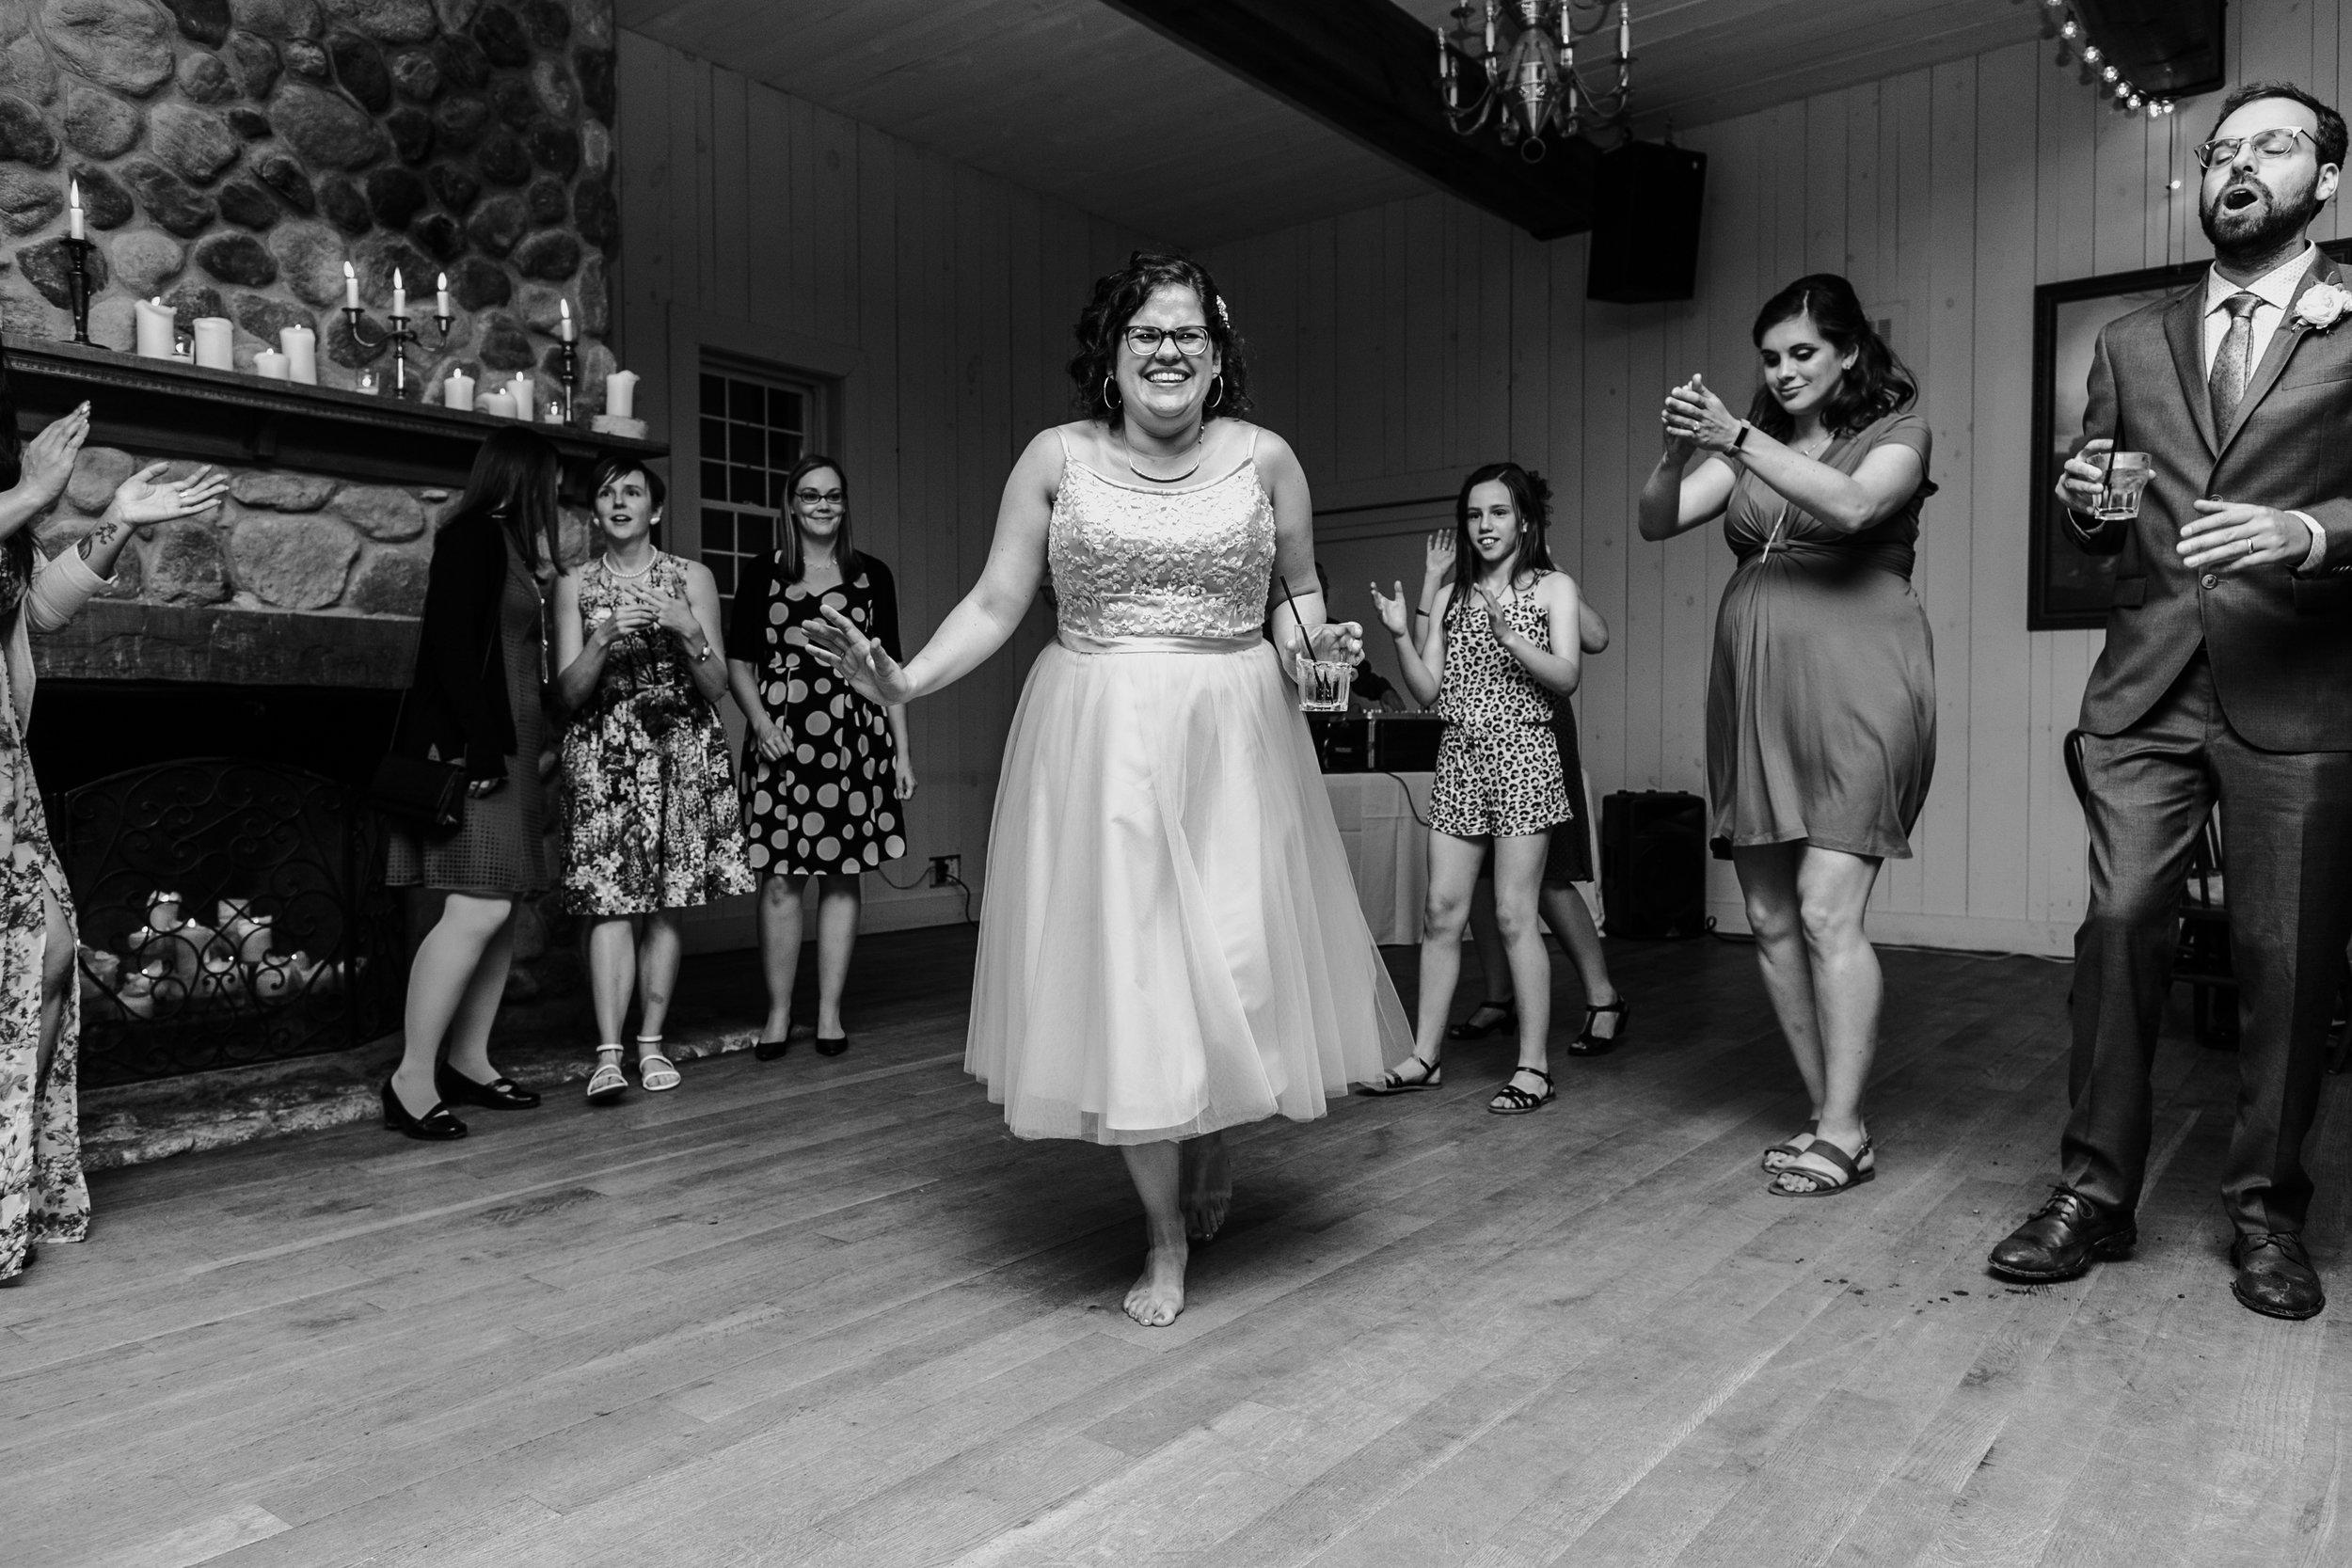 wedding pictures-605.jpg